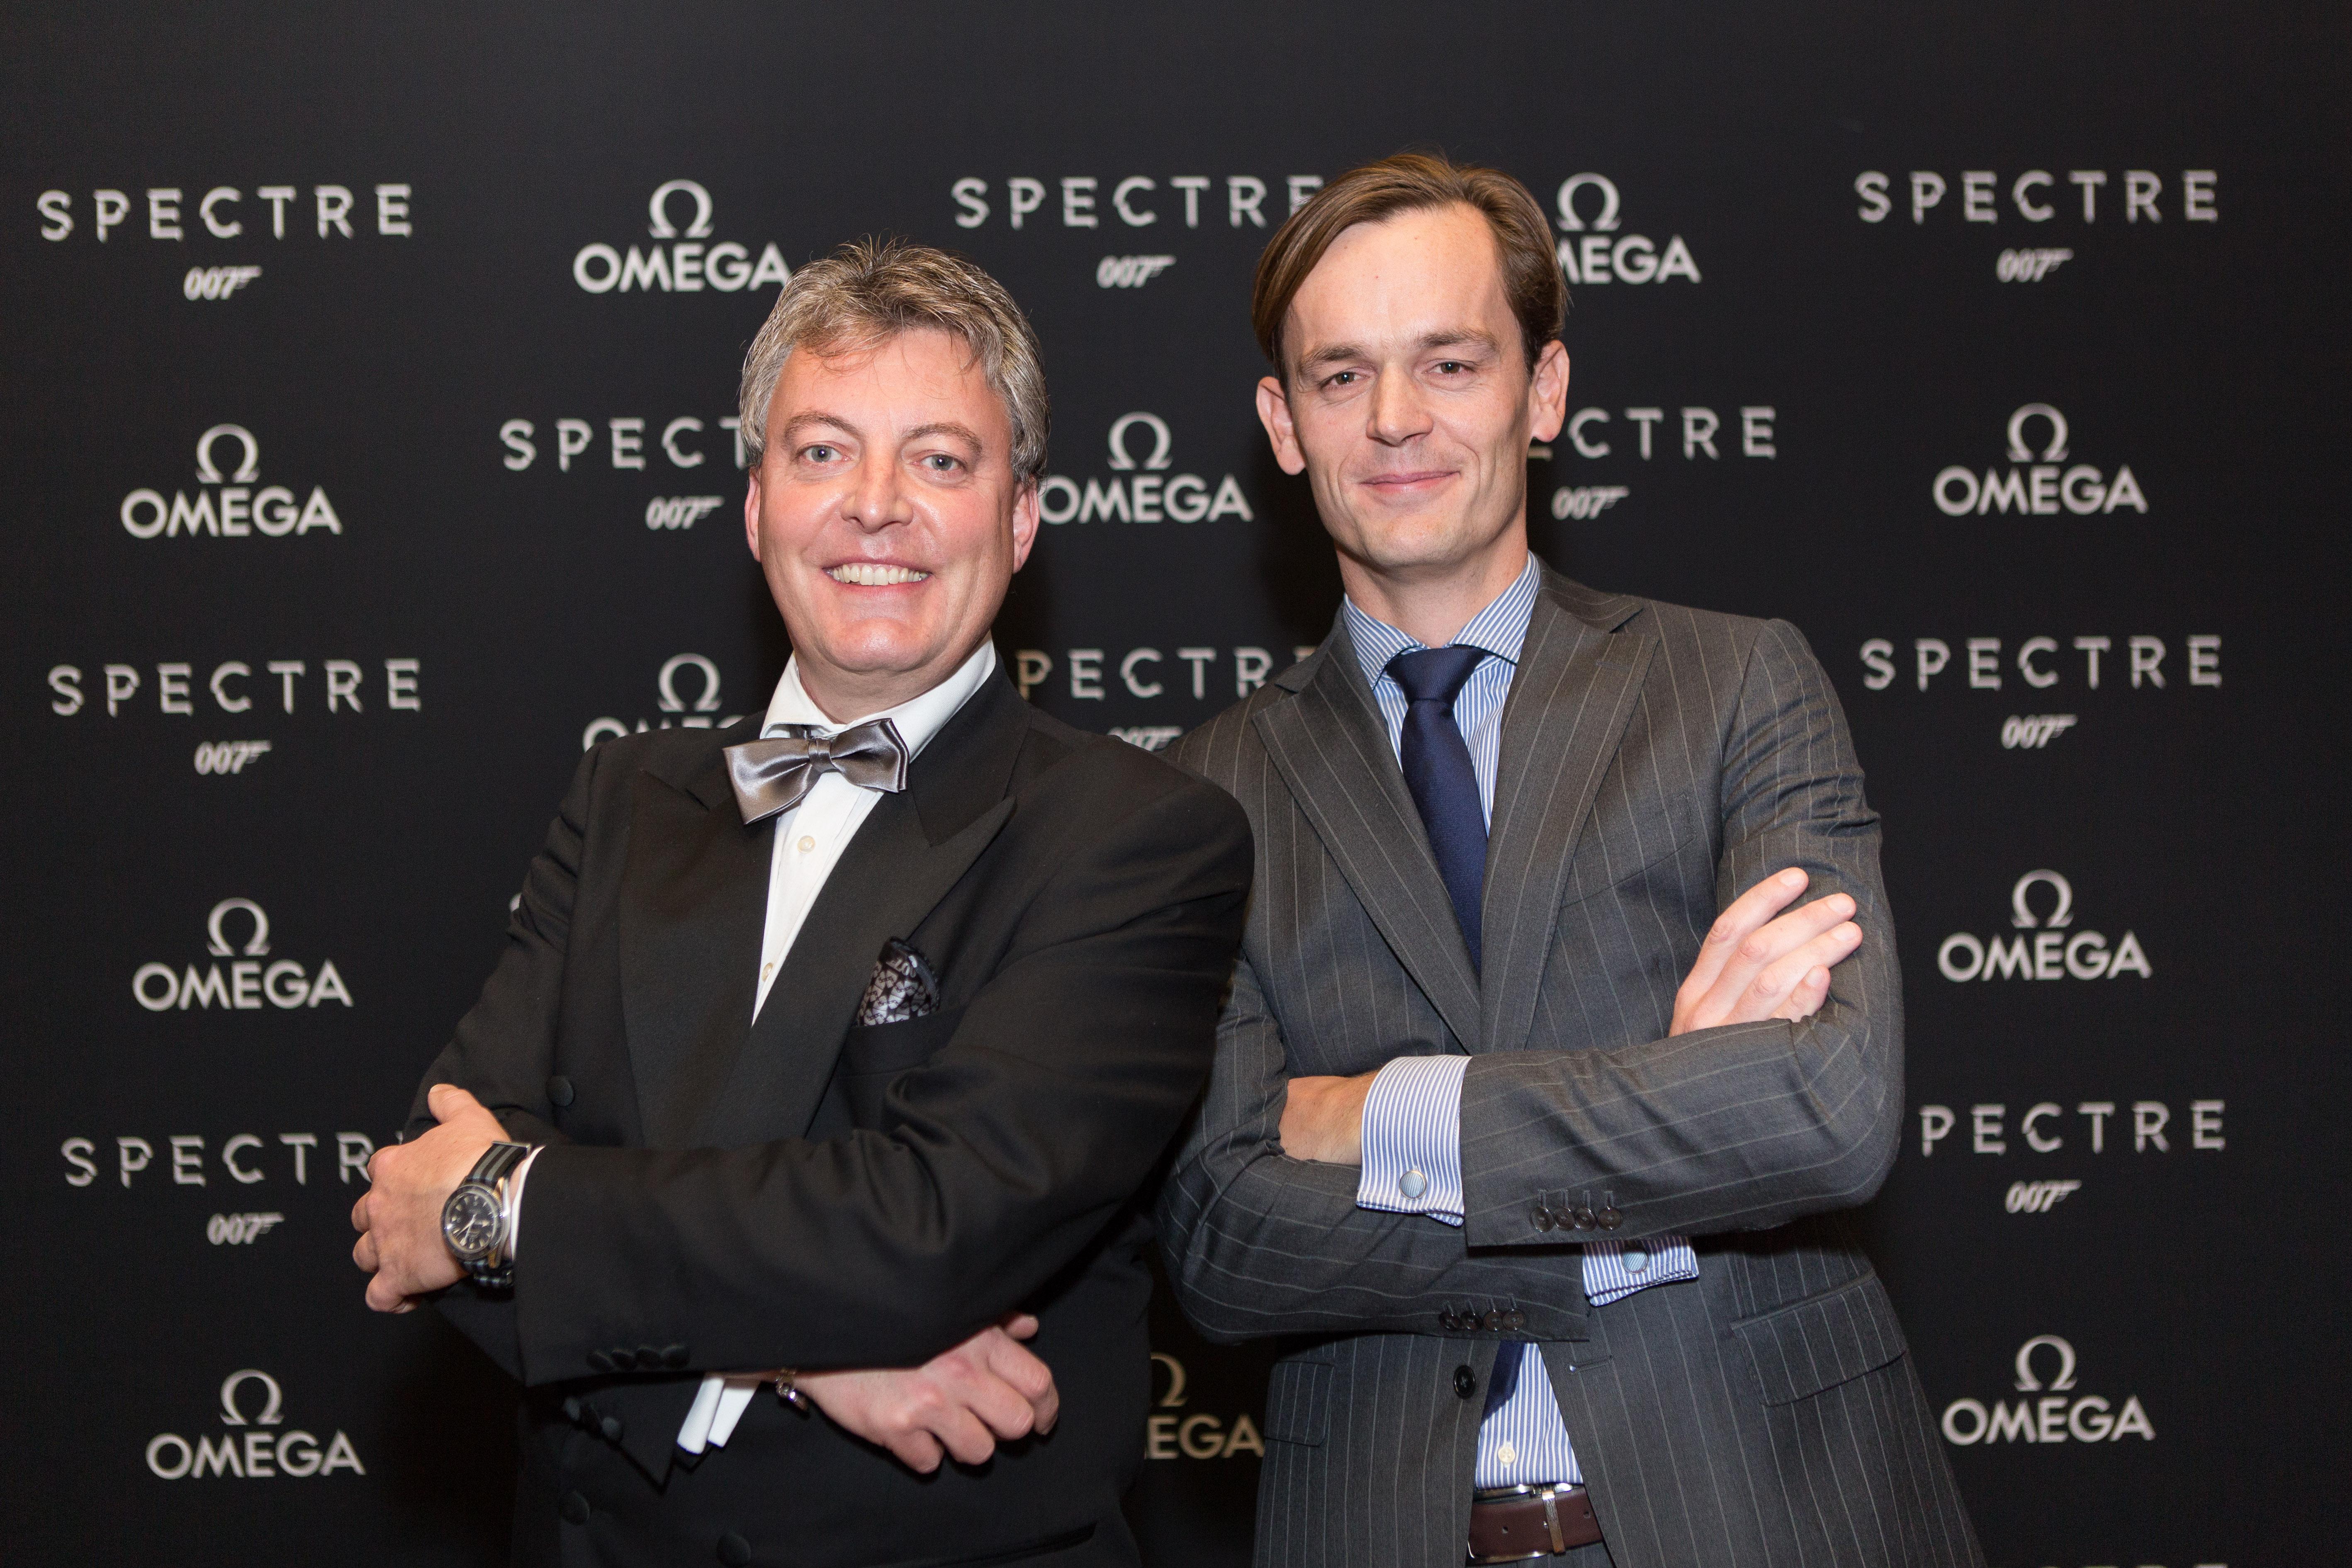 spectre-omega wall-93